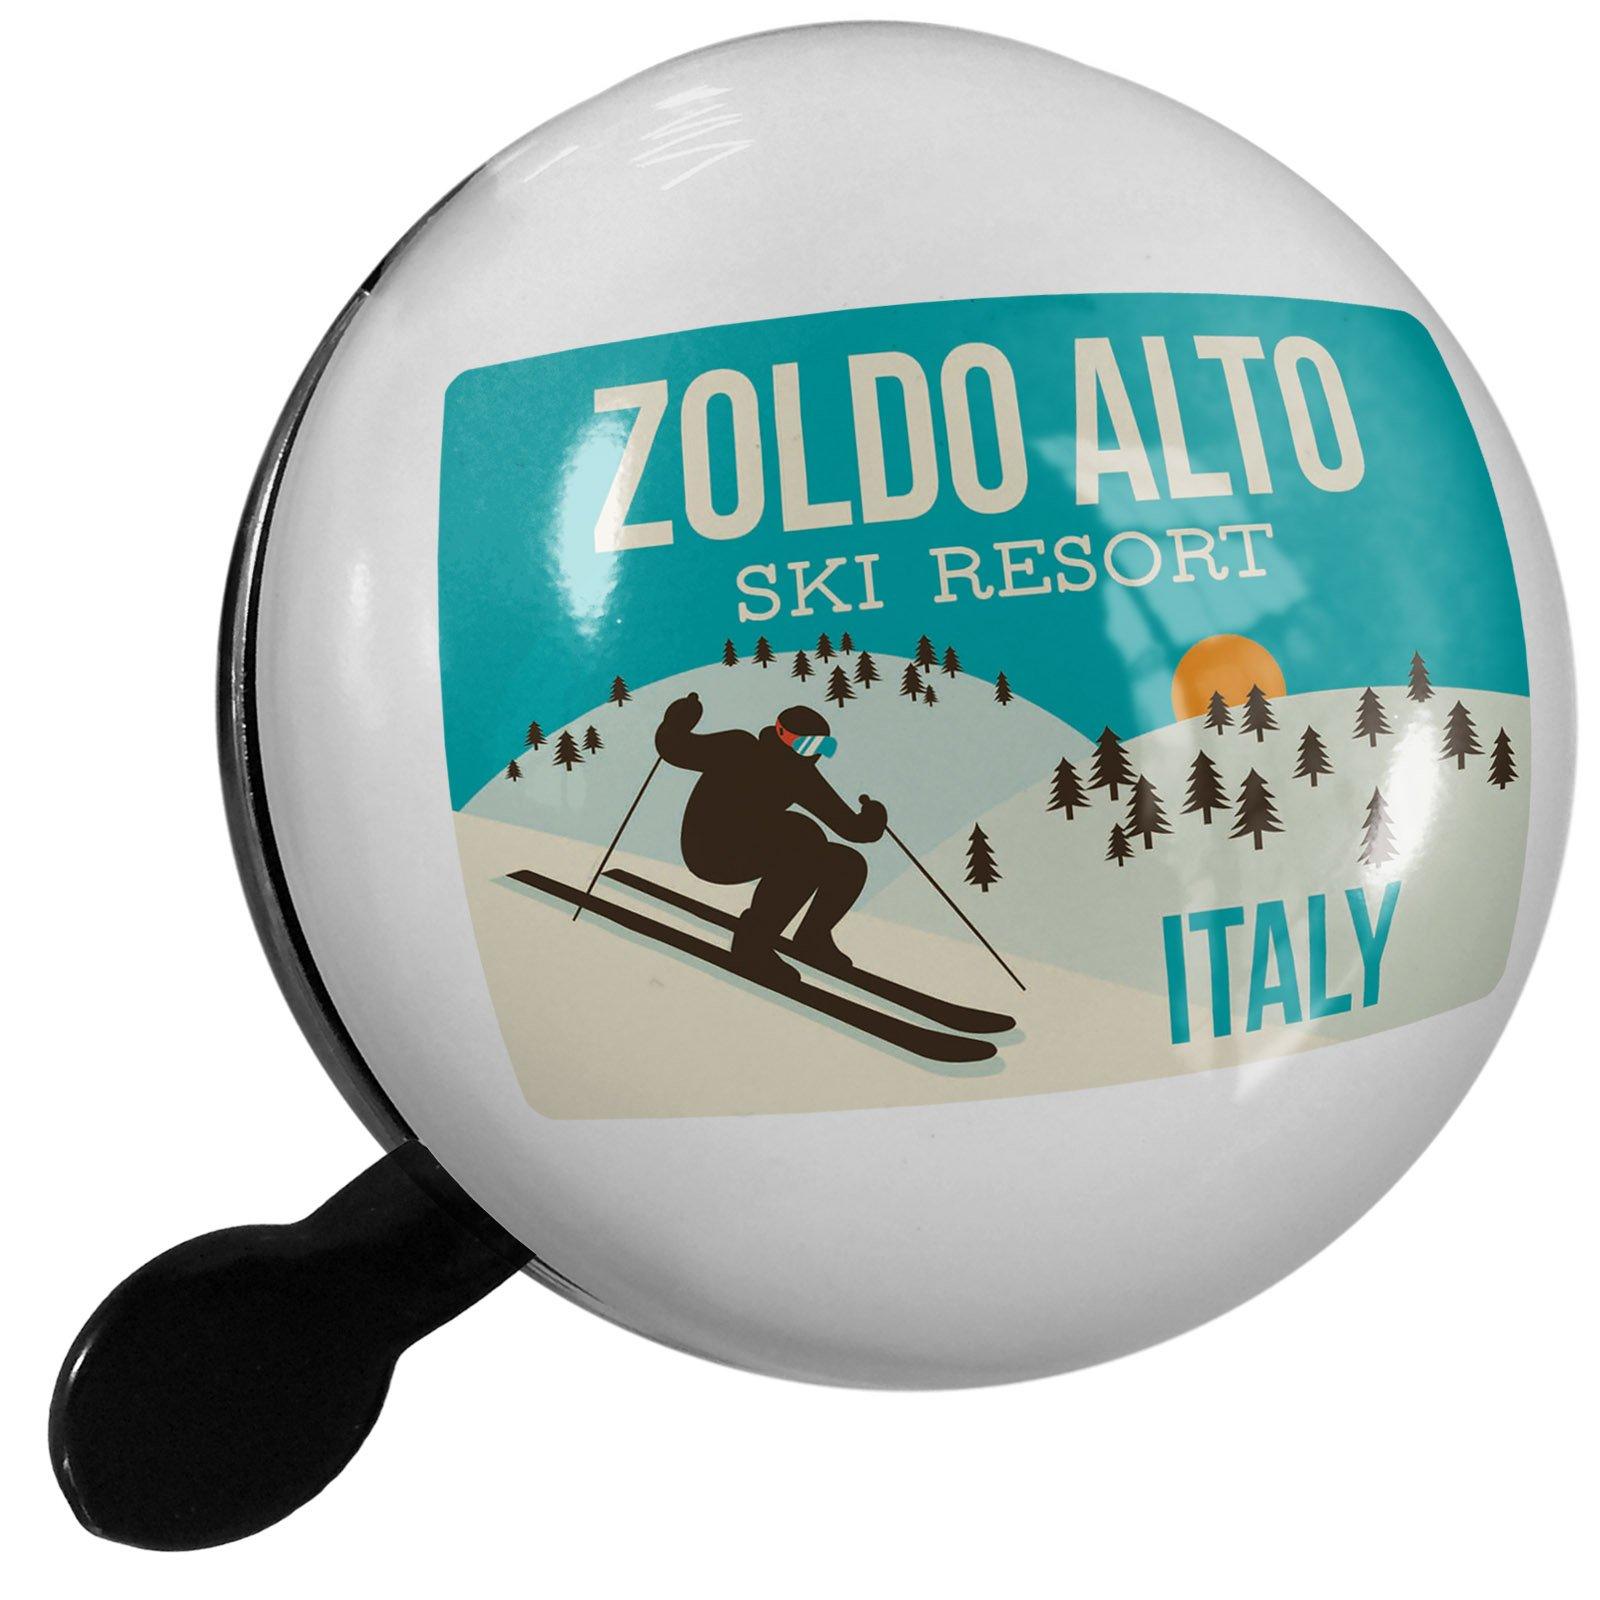 Small Bike Bell Zoldo Alto Ski Resort - Italy Ski Resort - NEONBLOND